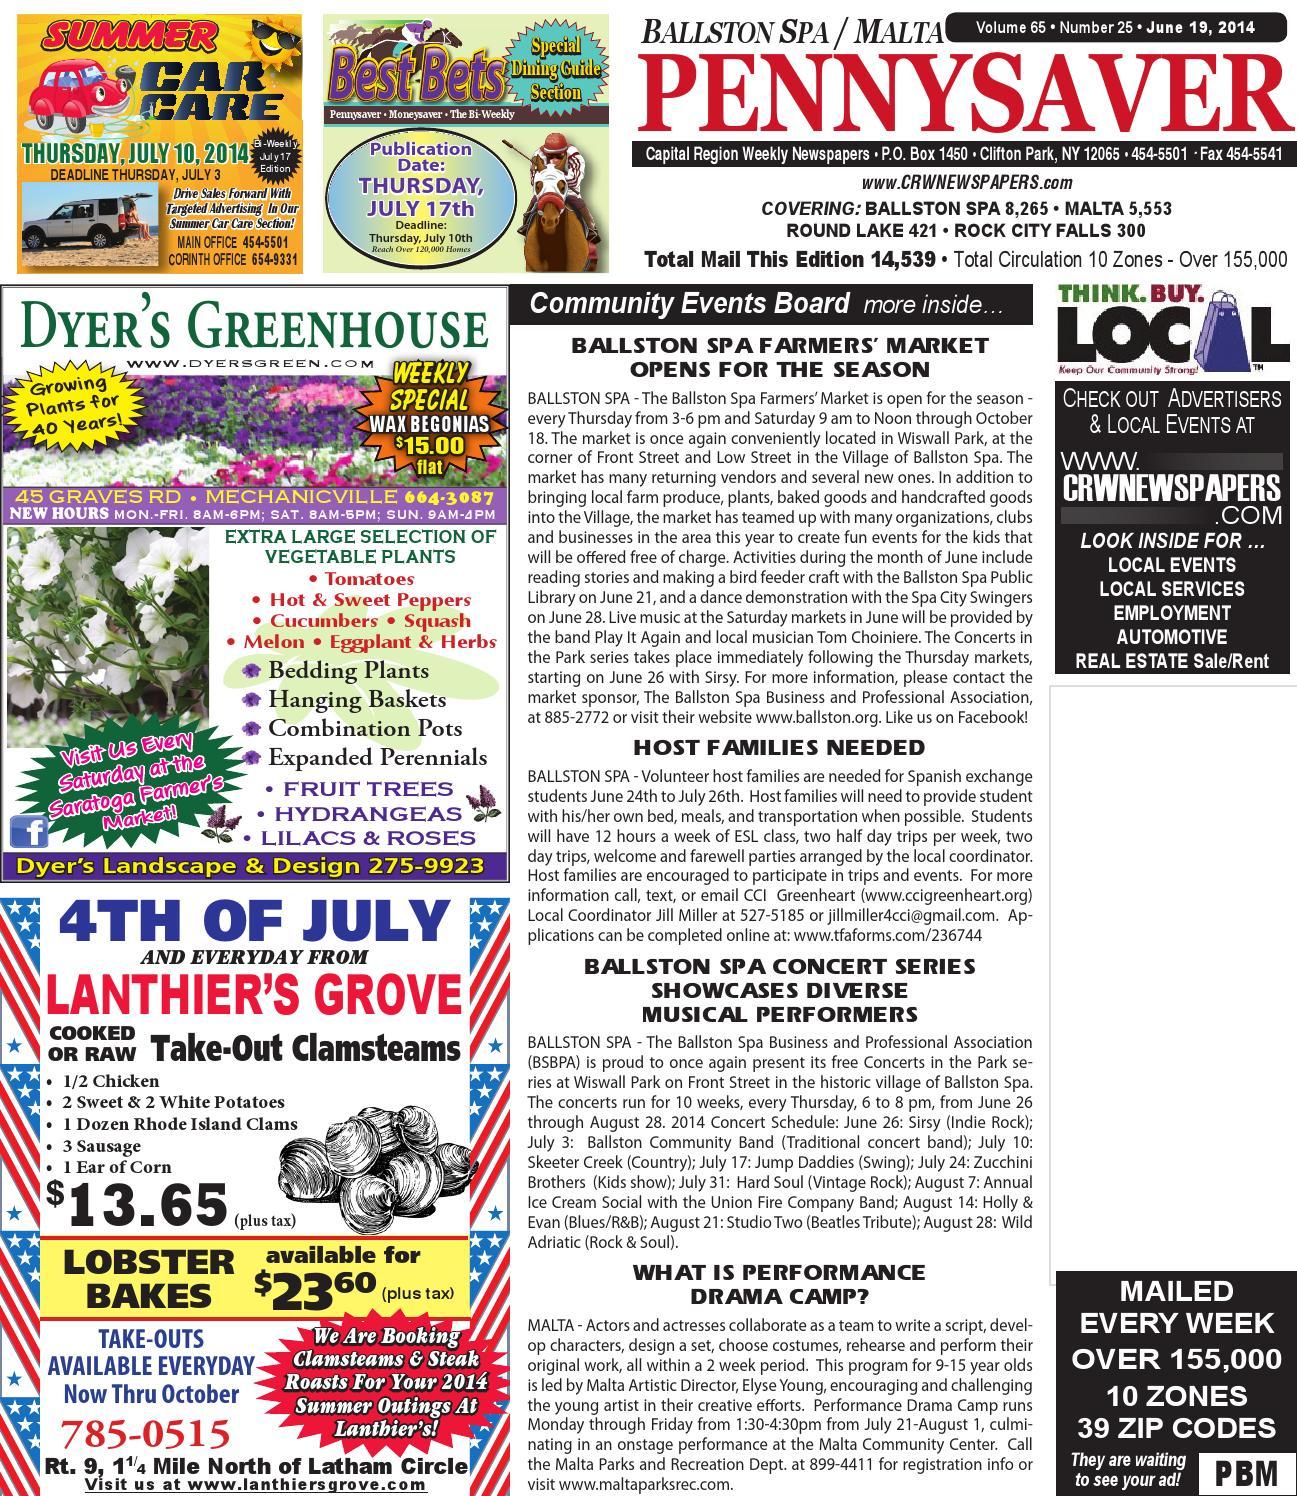 Ballston Spa Malta Pennysaver 061914 By Capital Region Weekly